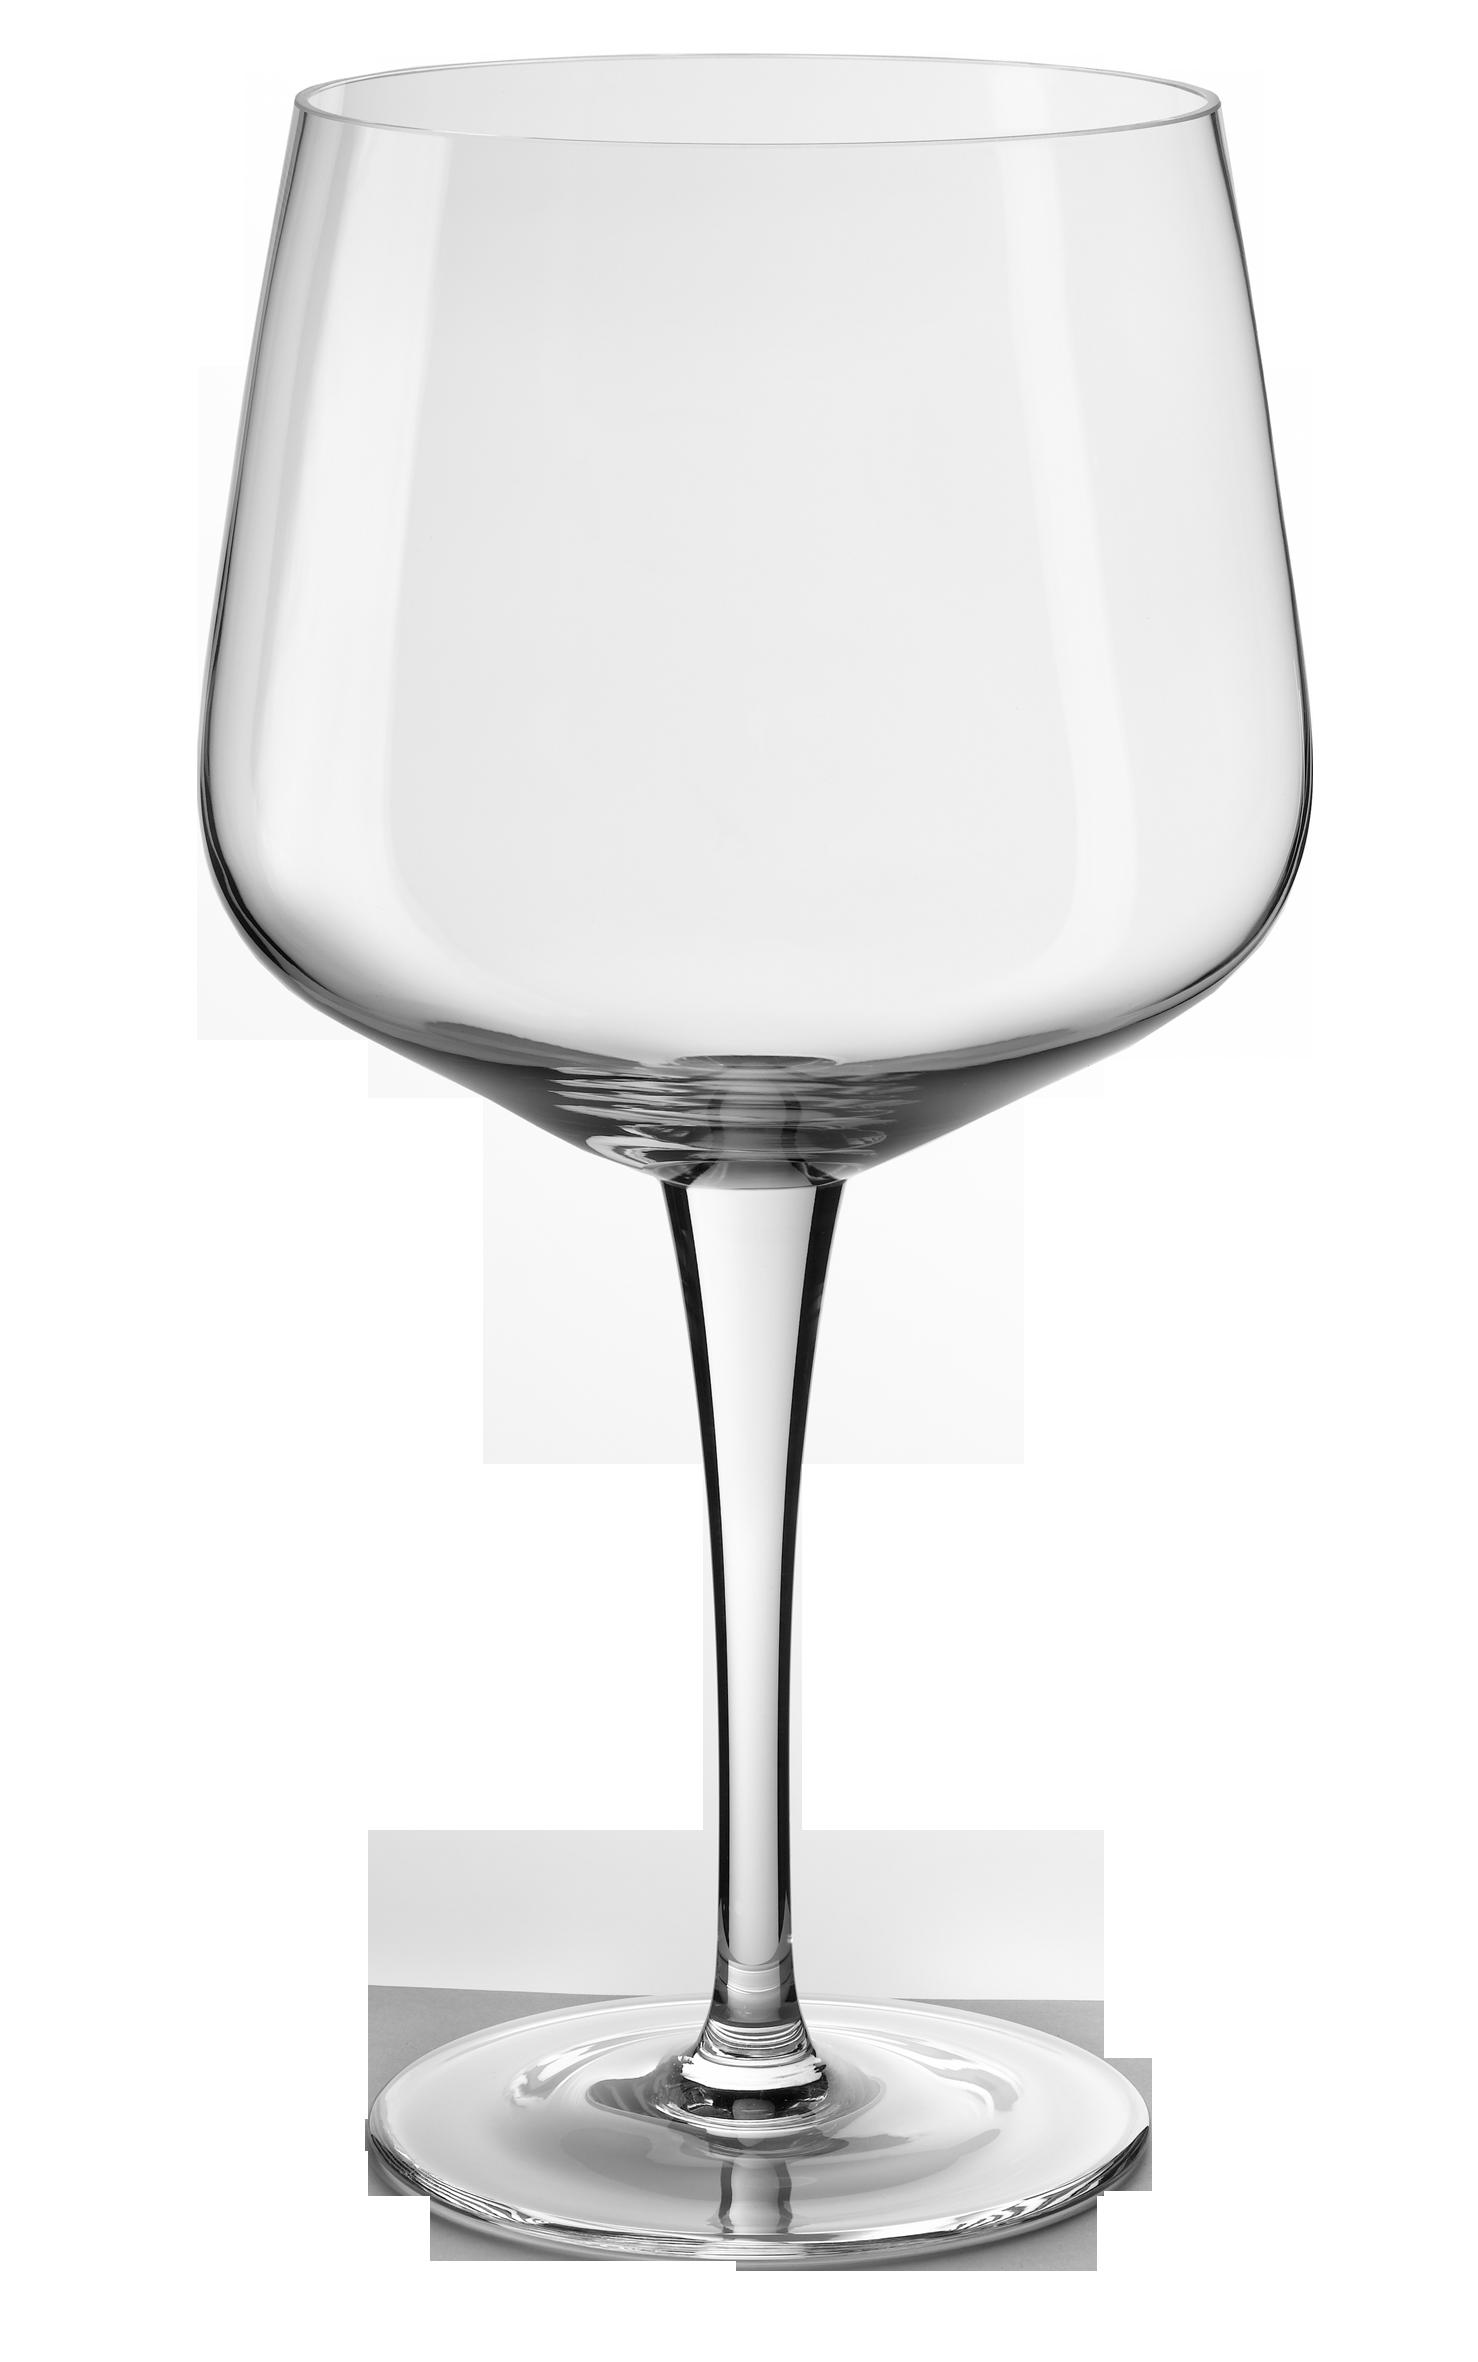 Regala gin tonic